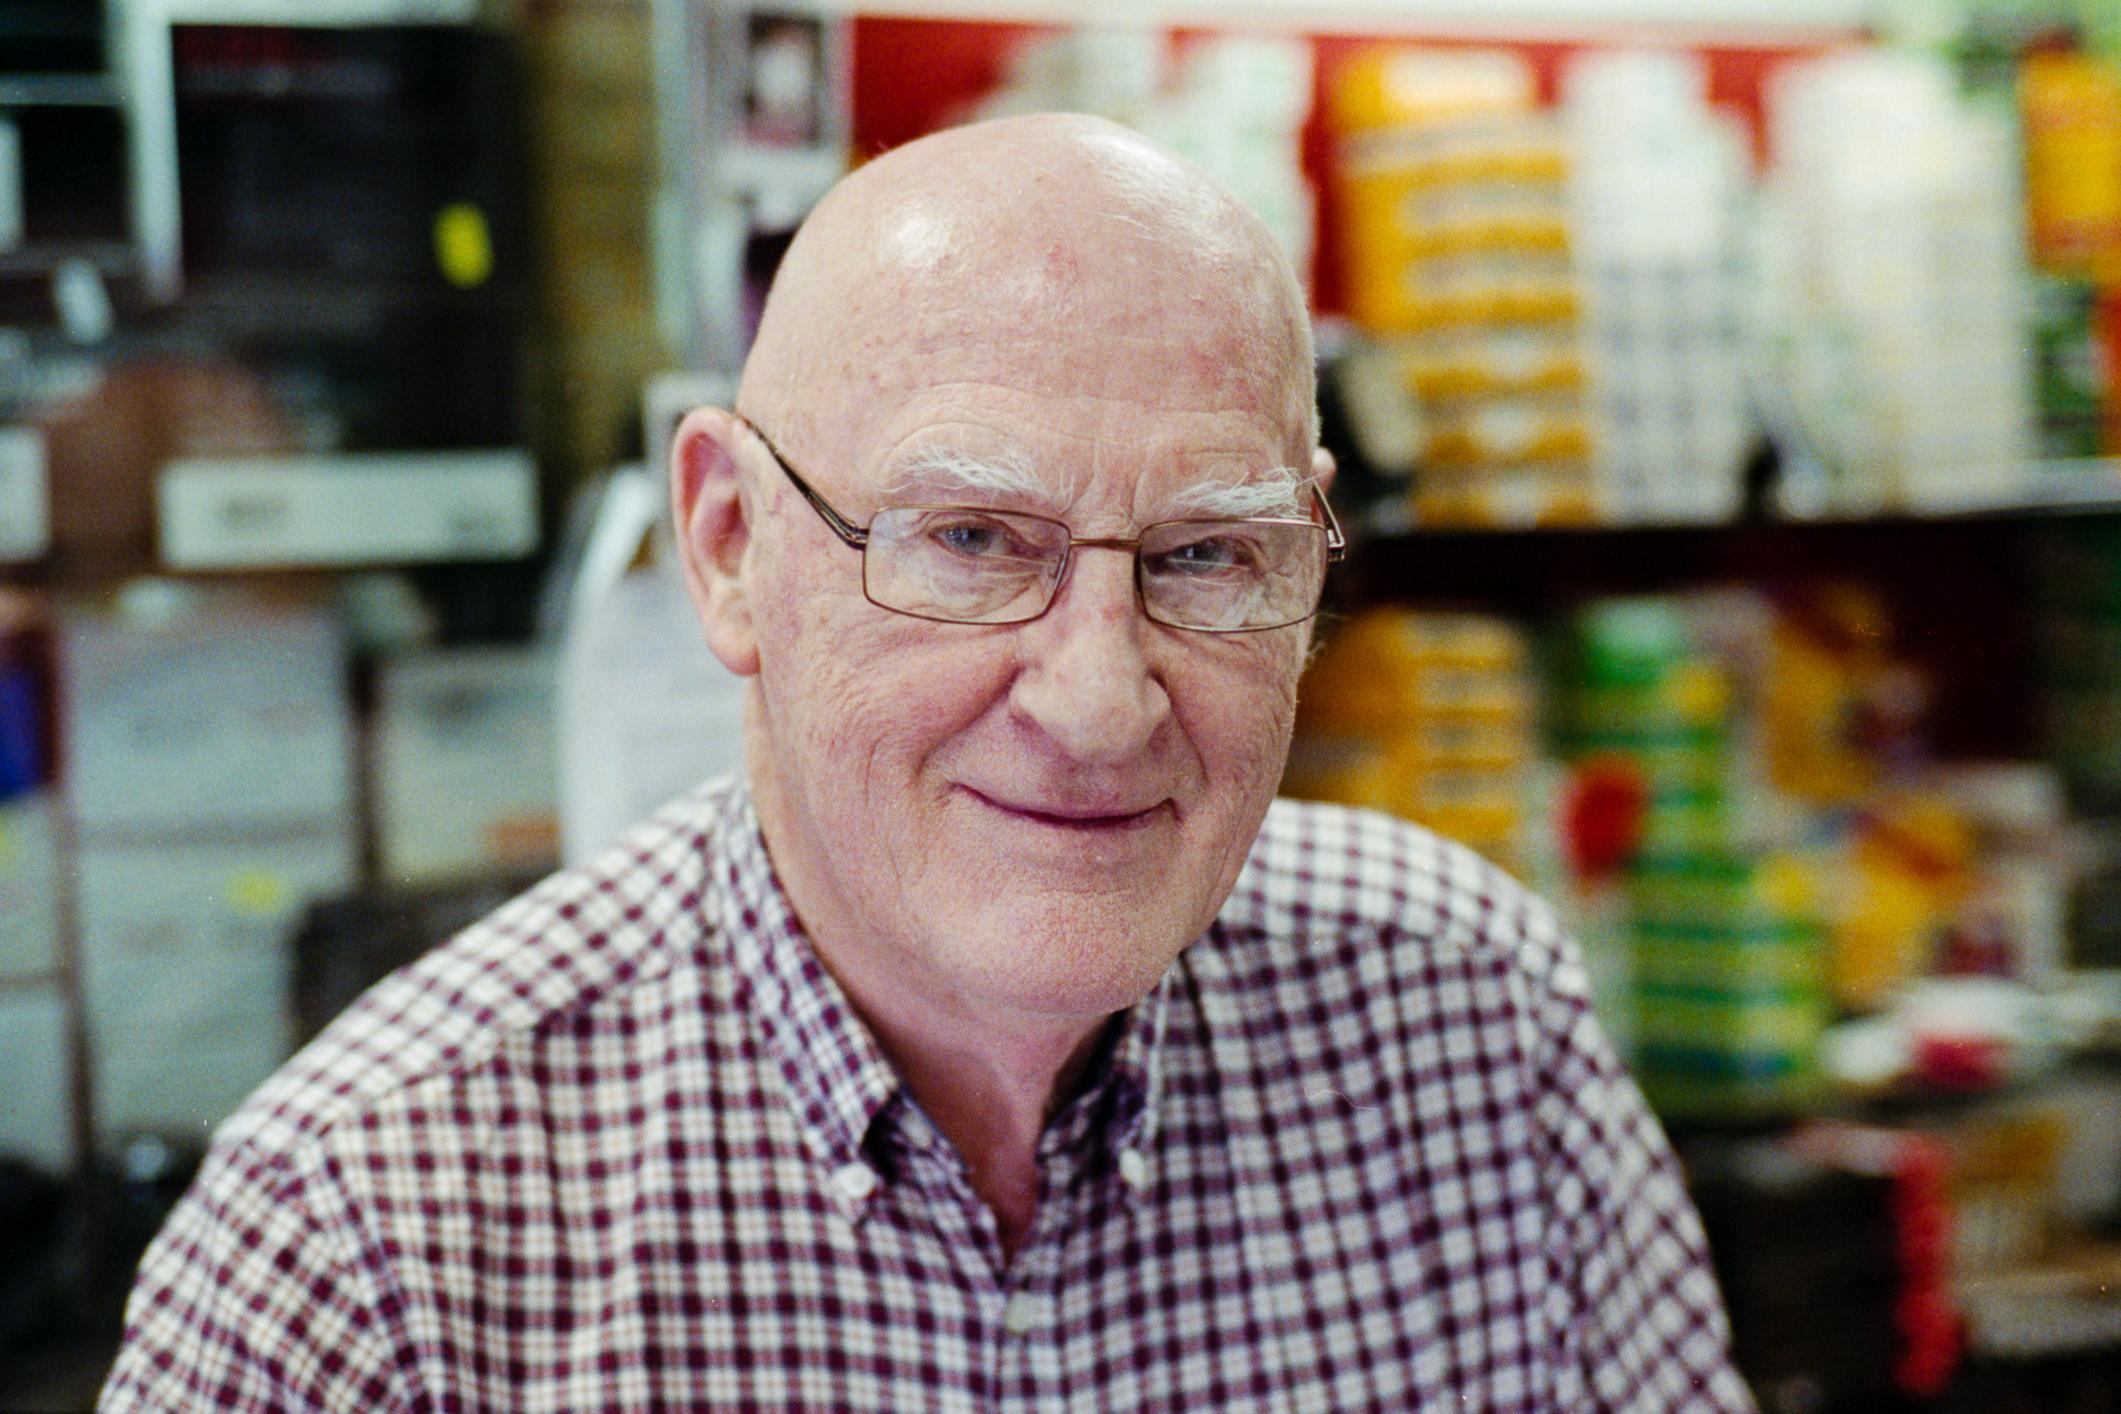 Mr John Gunn from John Gunn Camera Shop (Dublin 2015), Leica M2, Zeiss C Sonnar 50mm f/1.5 @ f/2, Fuji Xtra 800, Epson V700